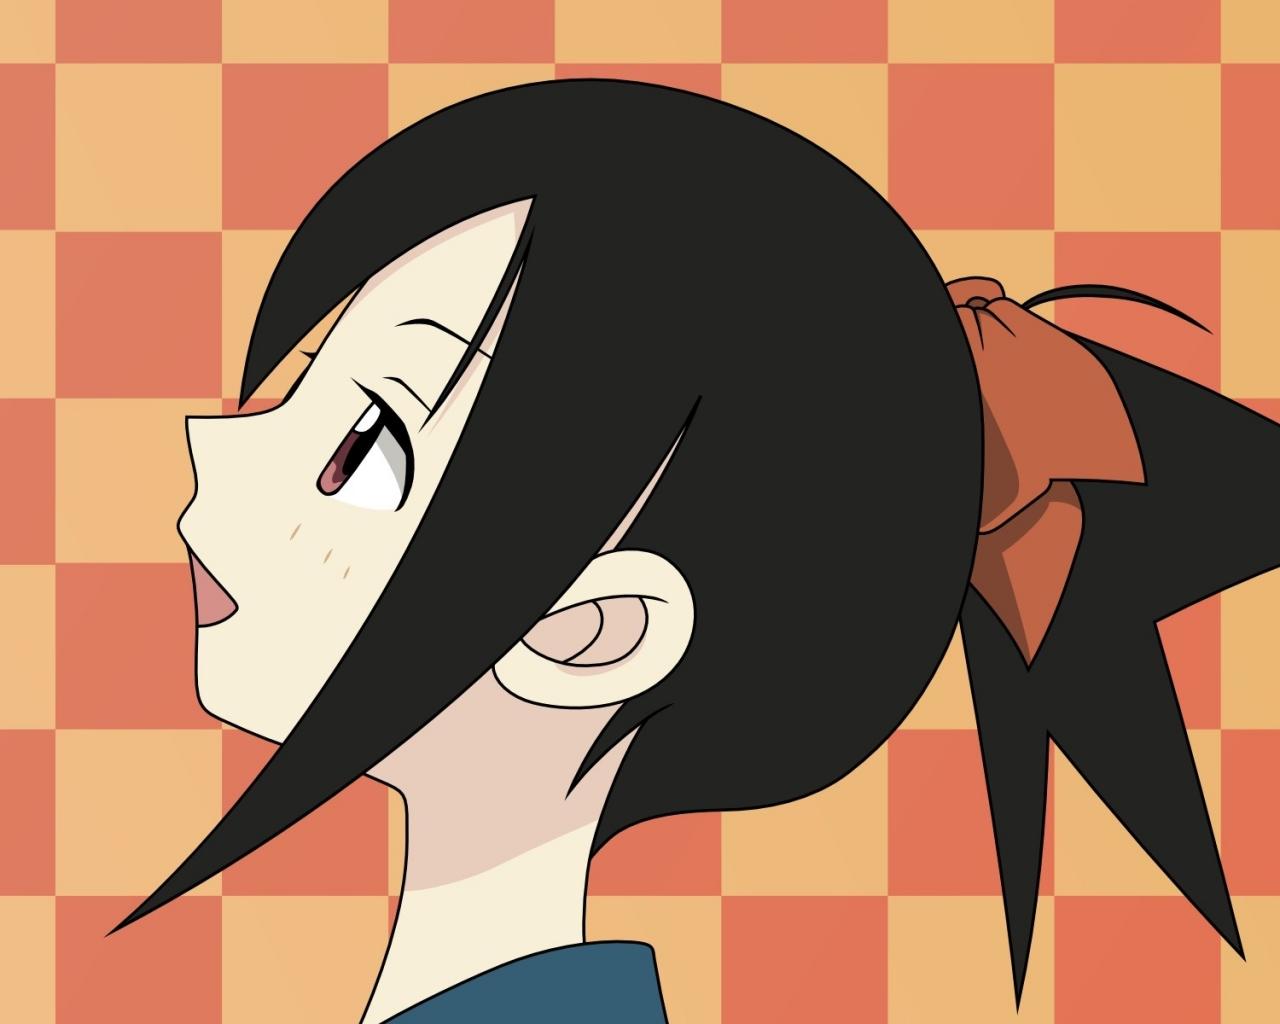 Nezu Miko - 1280x1024